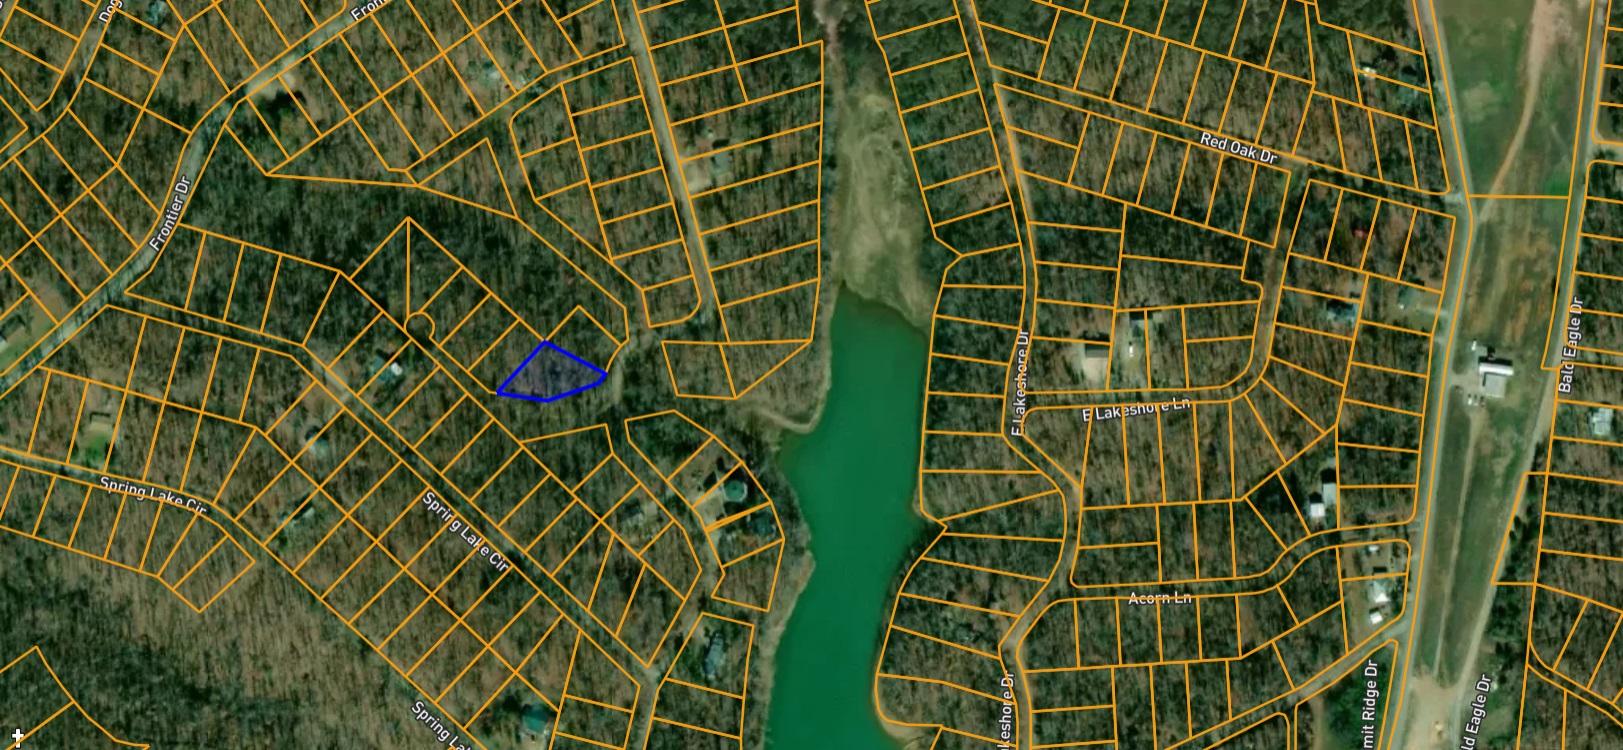 0 W Lakeshore Dr, Ozark Acres, AR 72482